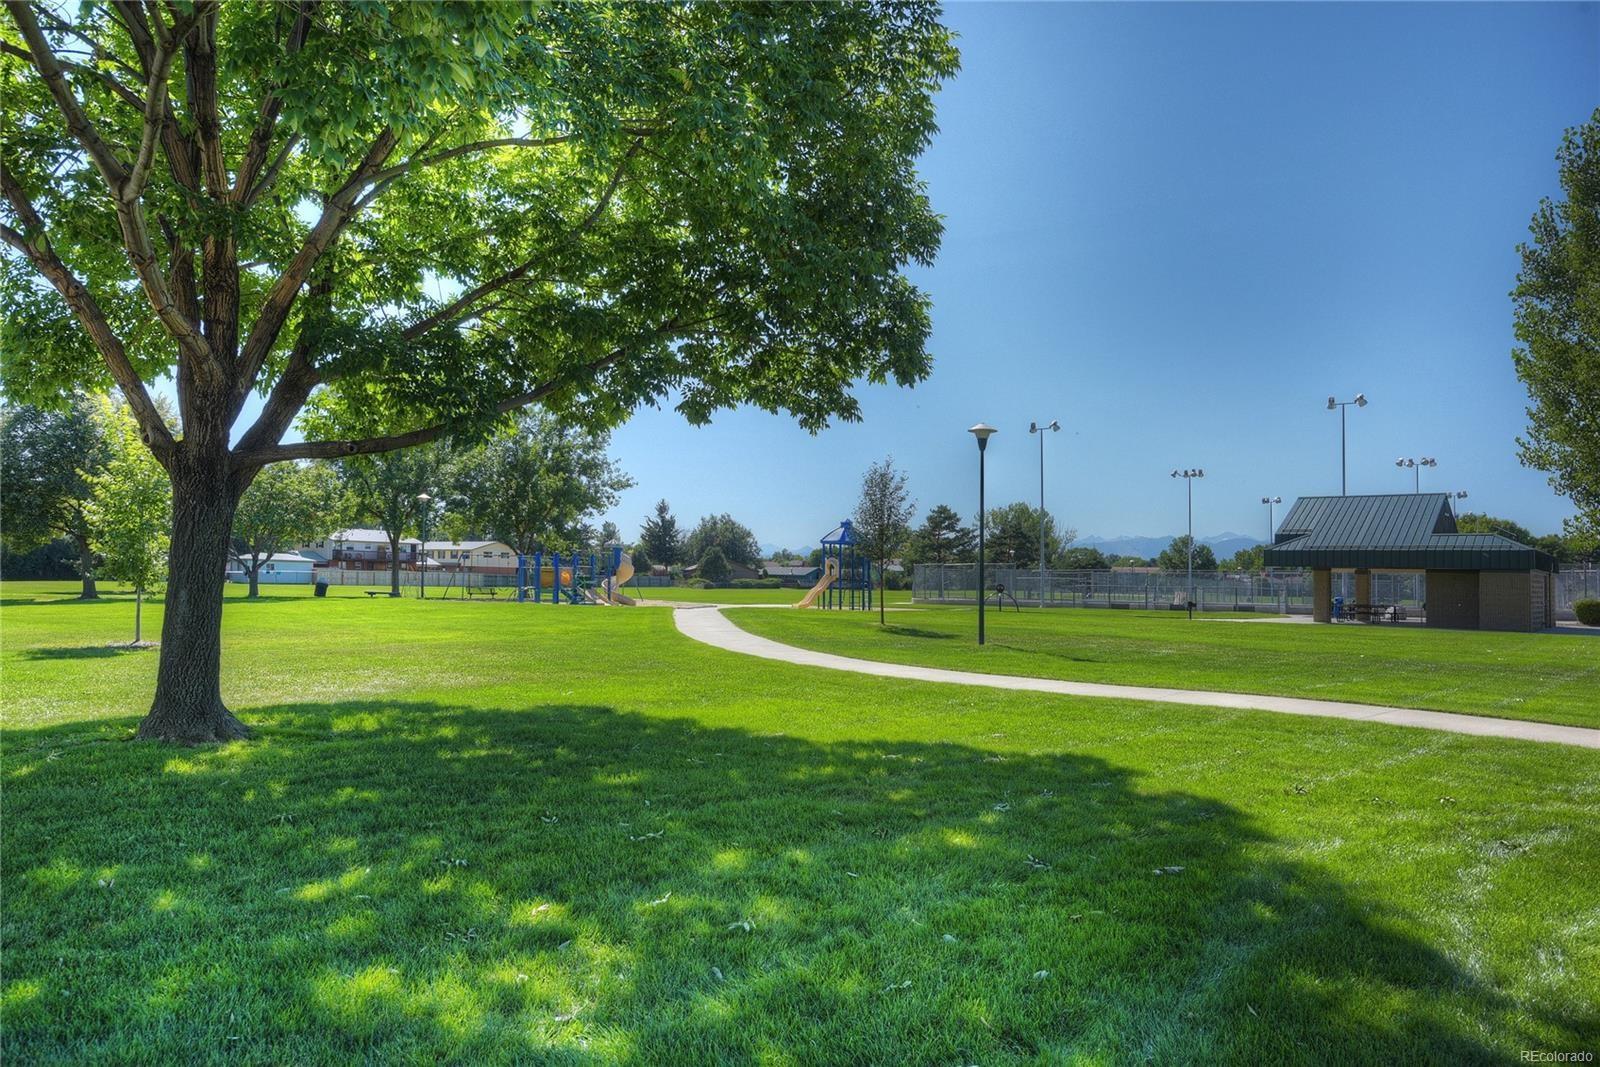 MLS# 4246568 - 1 - 1101  21 Avenue, Longmont, CO 80501